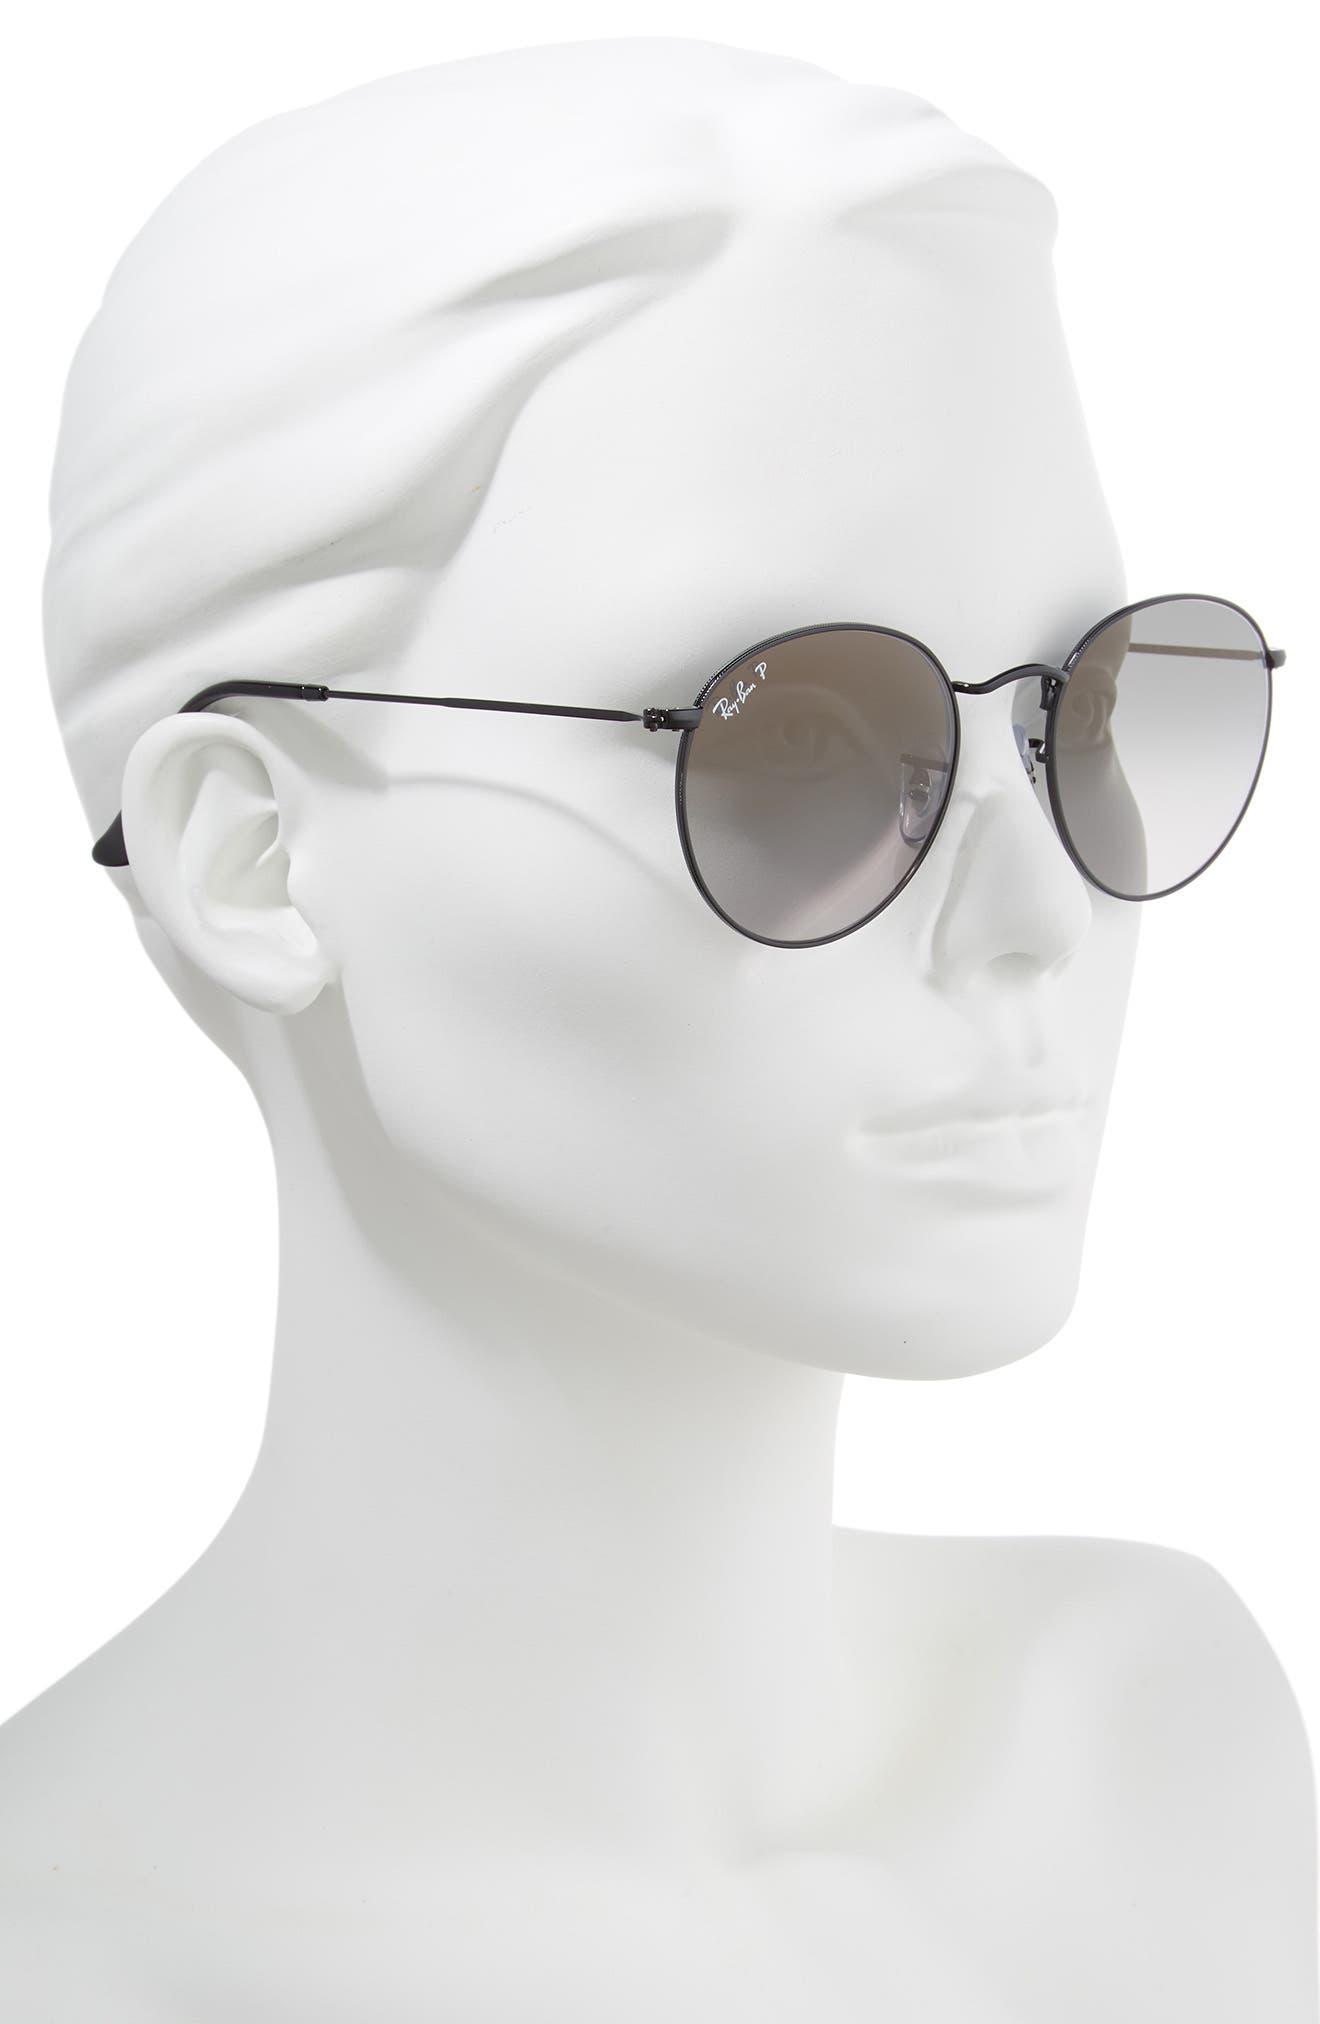 53mm Polarized Round Sunglasses,                             Alternate thumbnail 2, color,                             BLACK GRADIENT